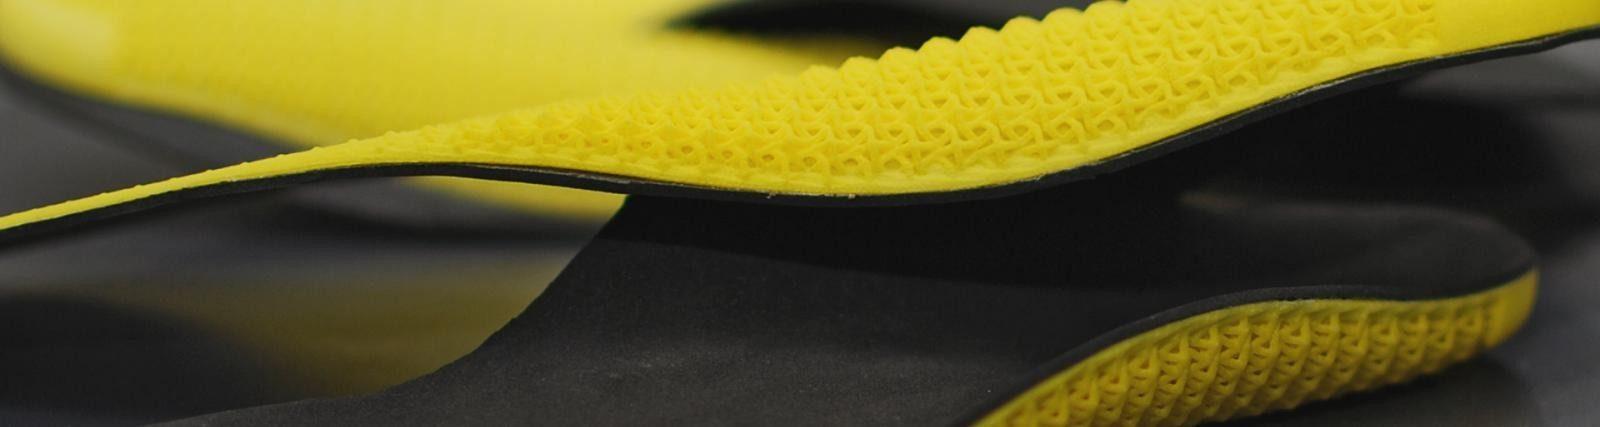 custom insoles - 3D printed